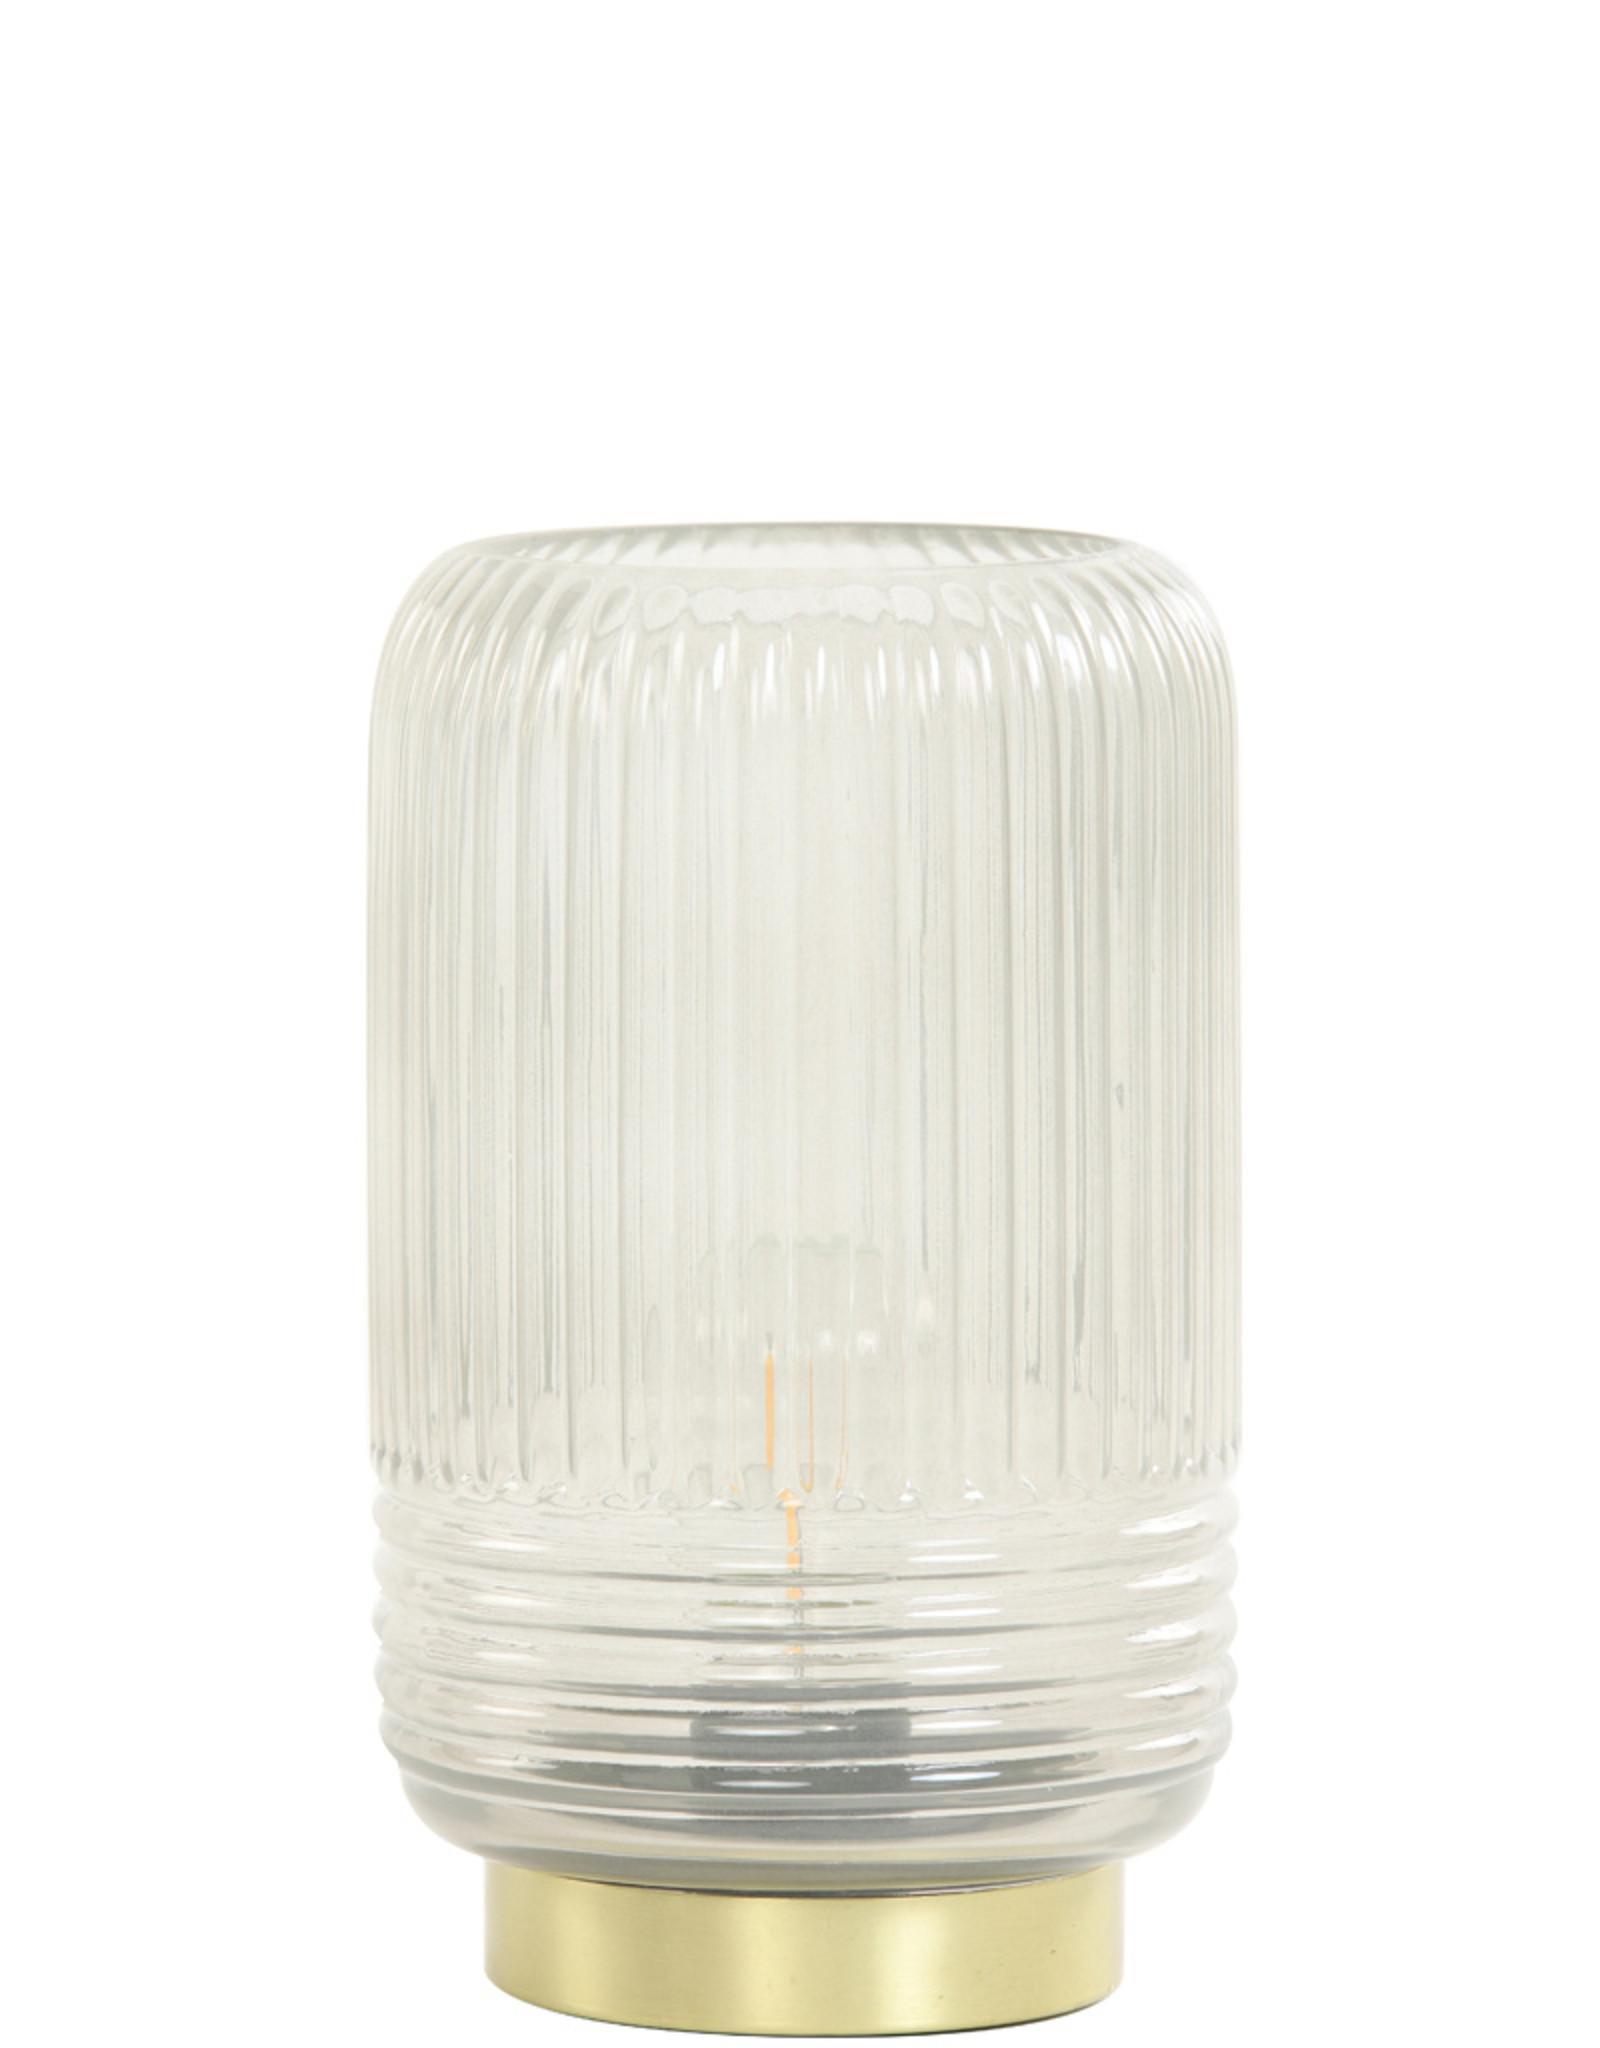 Light & Living Tafellamp LED 12x18.5cm Lipa glas warm grijs